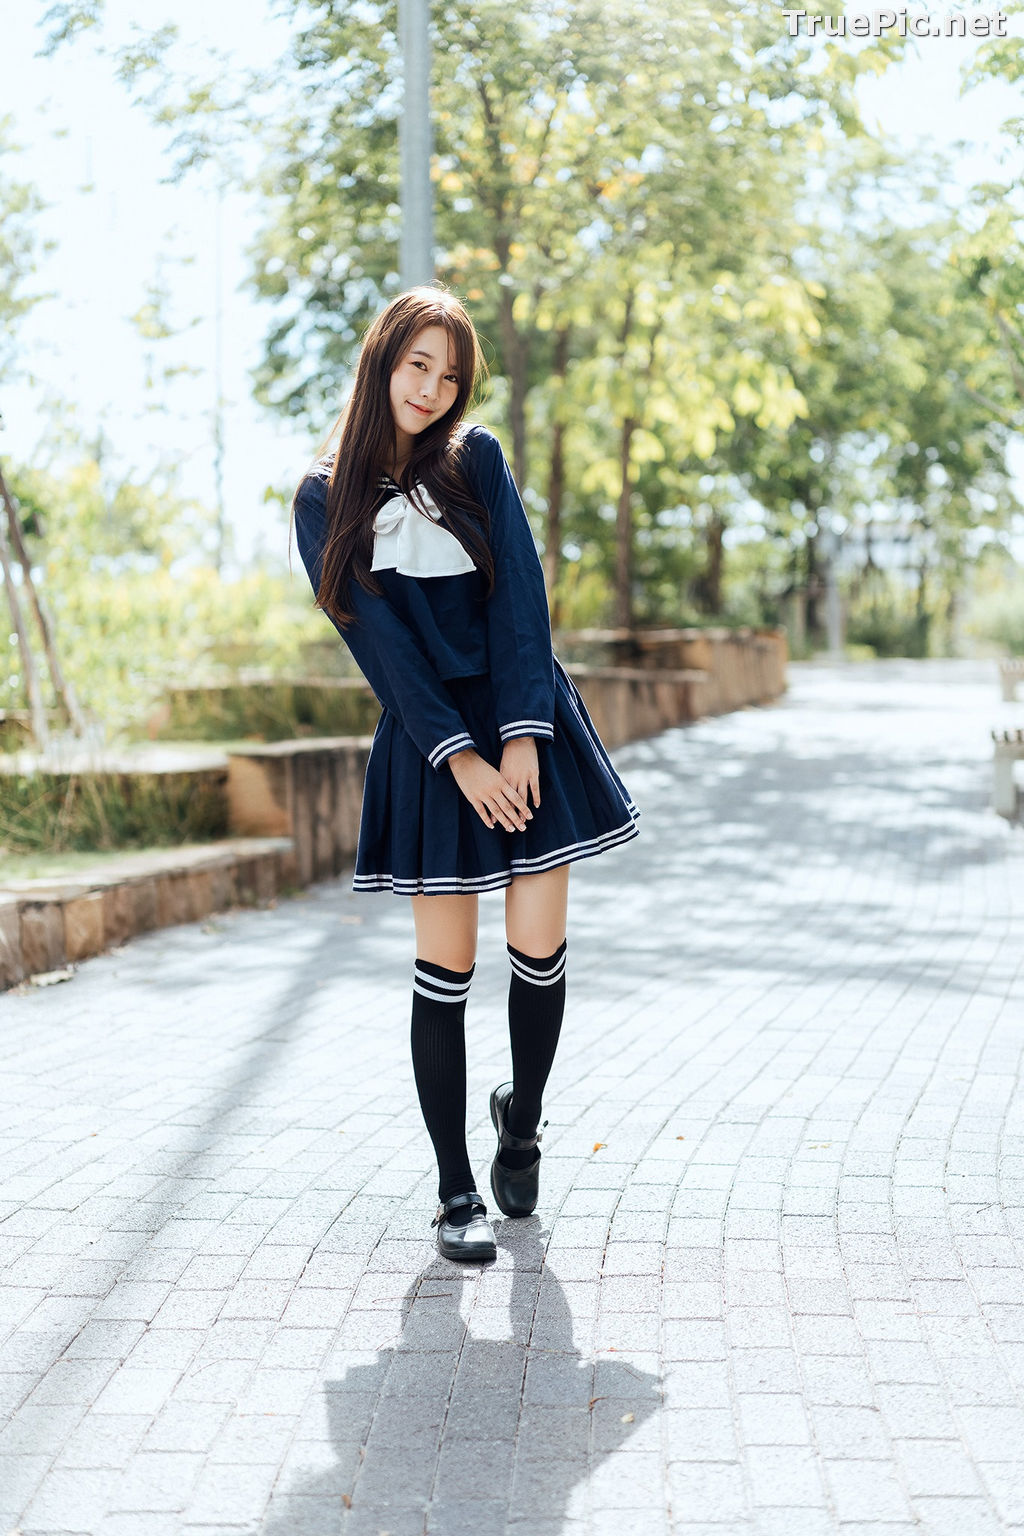 Image Thailand Cute Model - Pimpisa Kitiwini - After School - TruePic.net - Picture-2